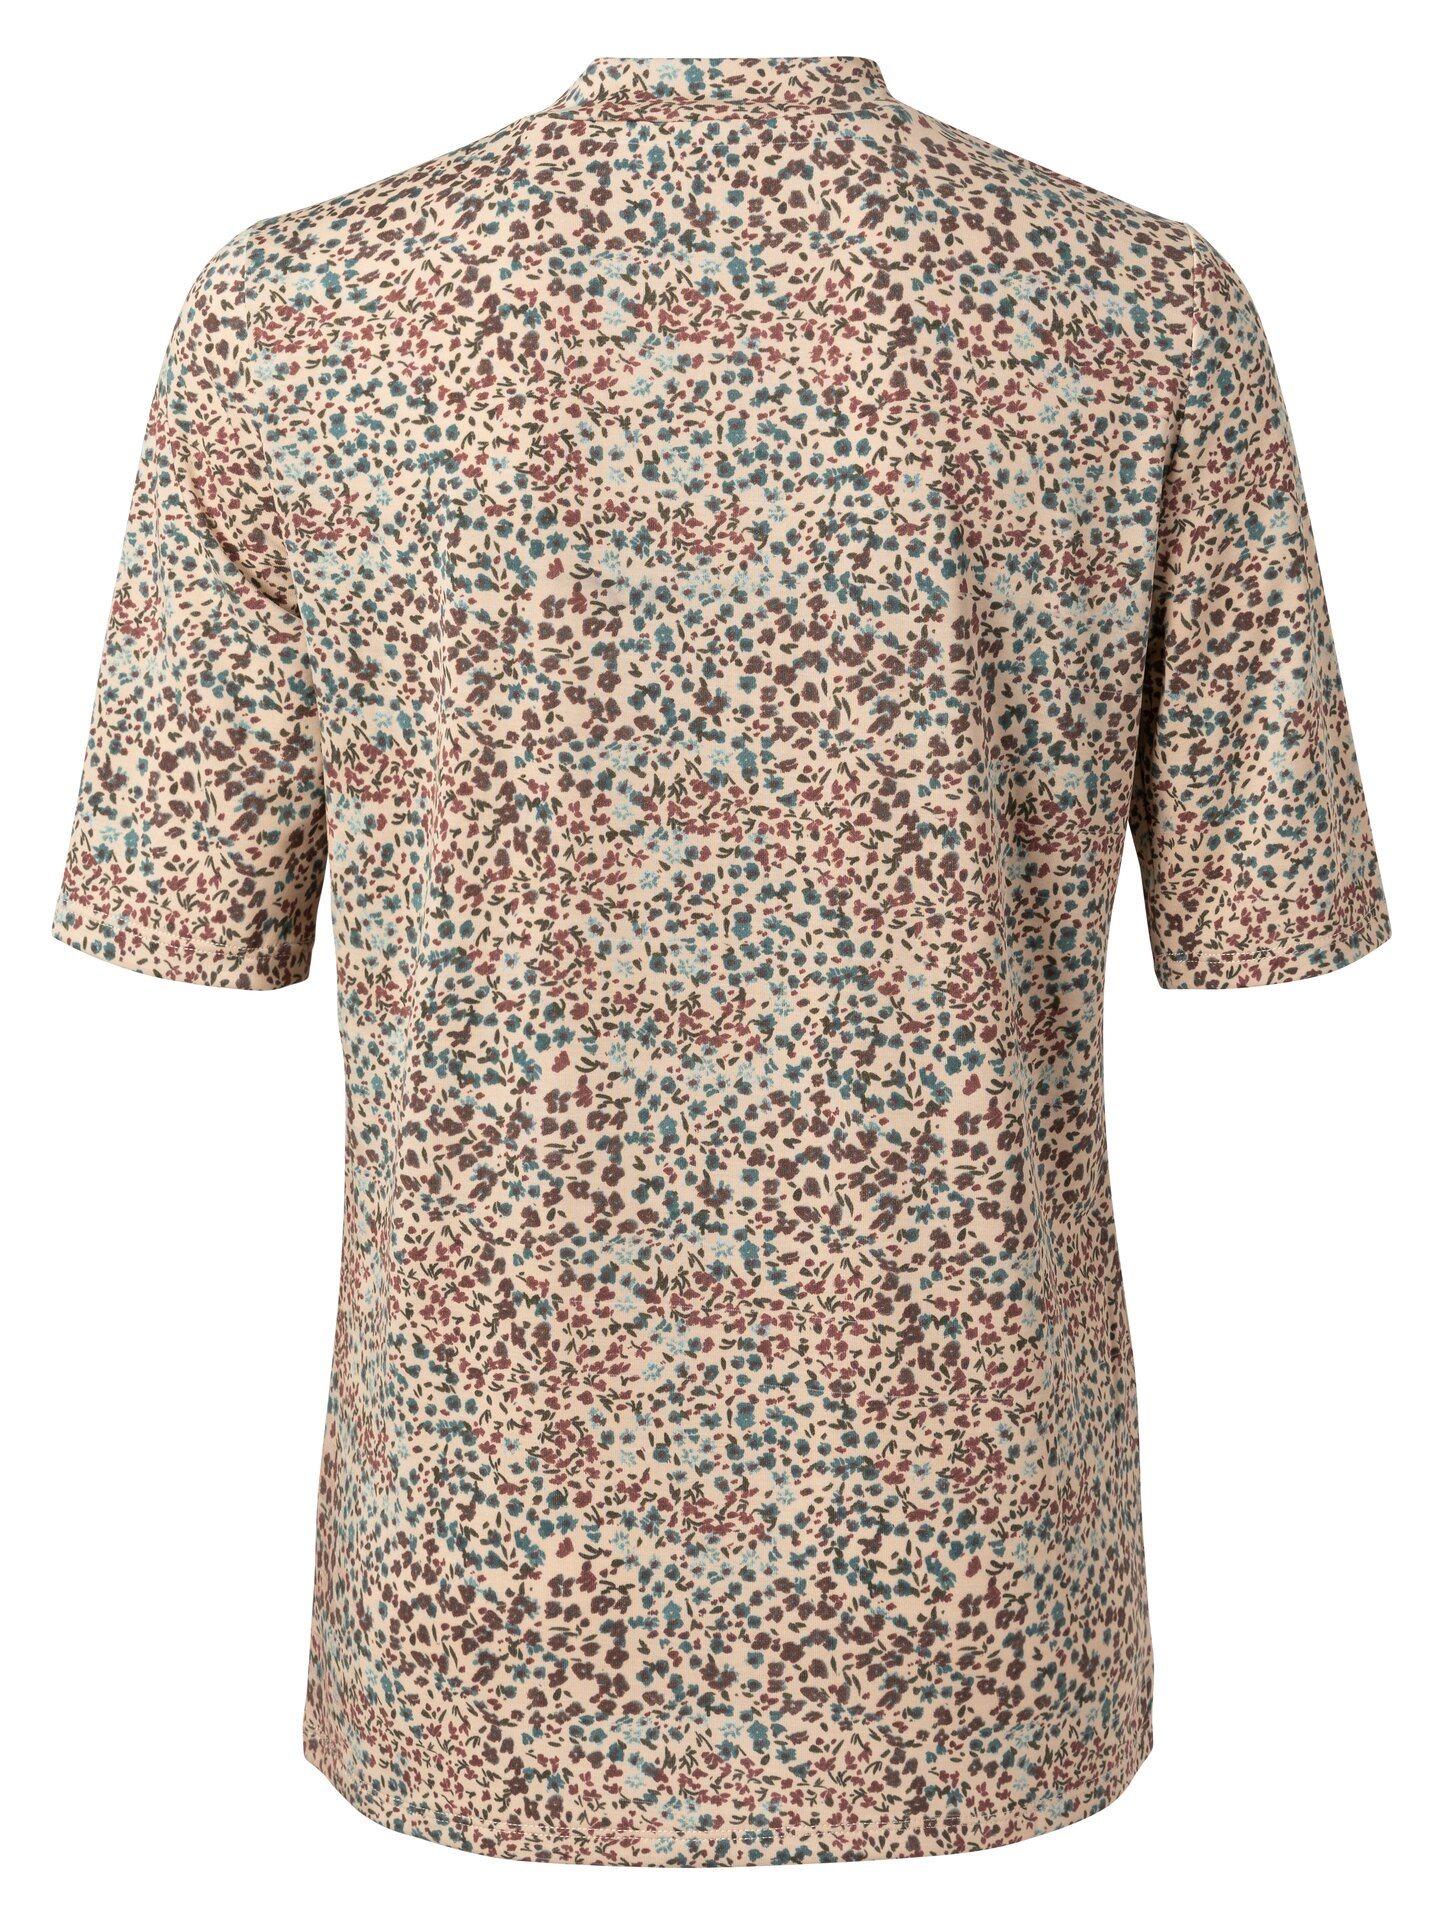 T-shirt Printed Mock Neck